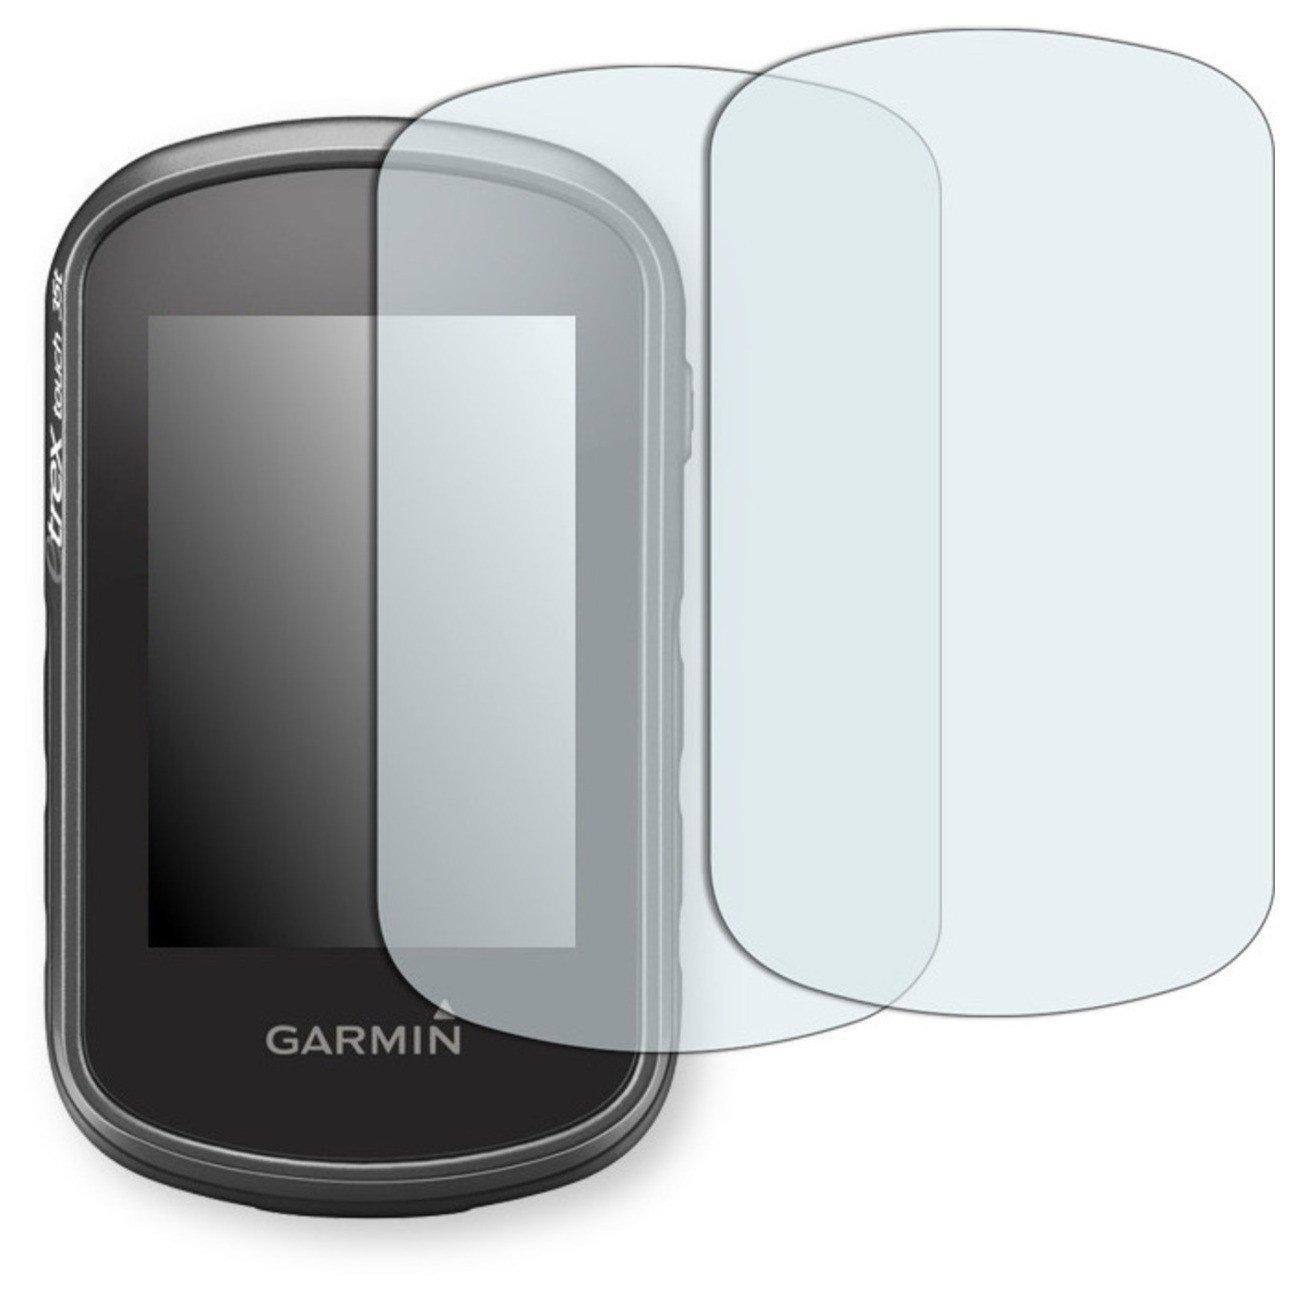 GOLEBO 2X Anti-Glare Screen Protector for Garmin eTrex Touch 35 (Anti-Reflex, Air Pocket Free Application, Easy to Remove)